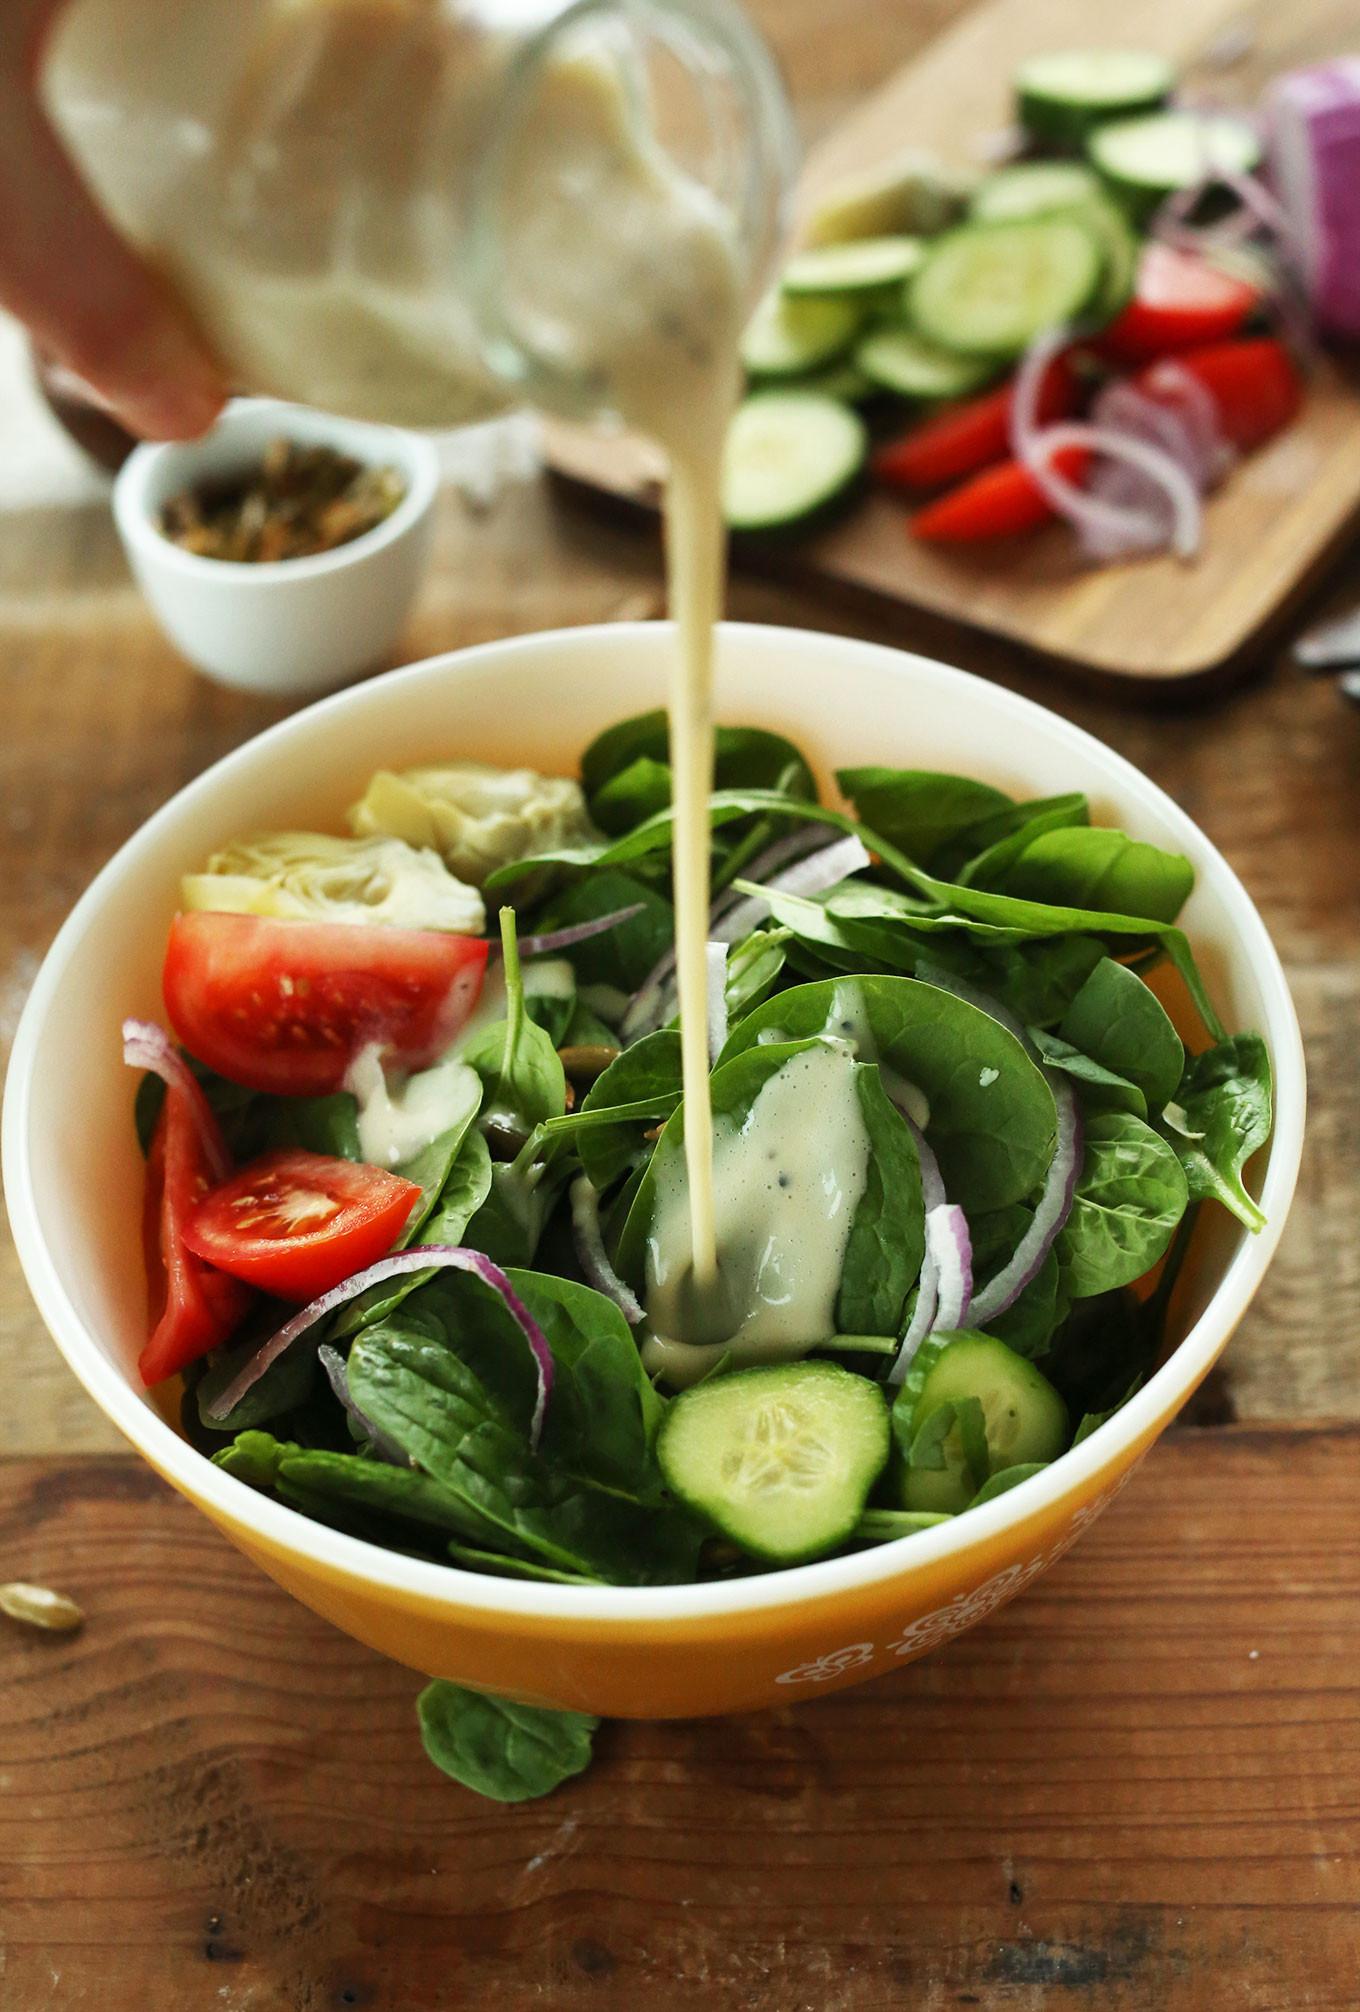 Vegetarian Spinach Salad Recipes  Creamy Spinach Salad